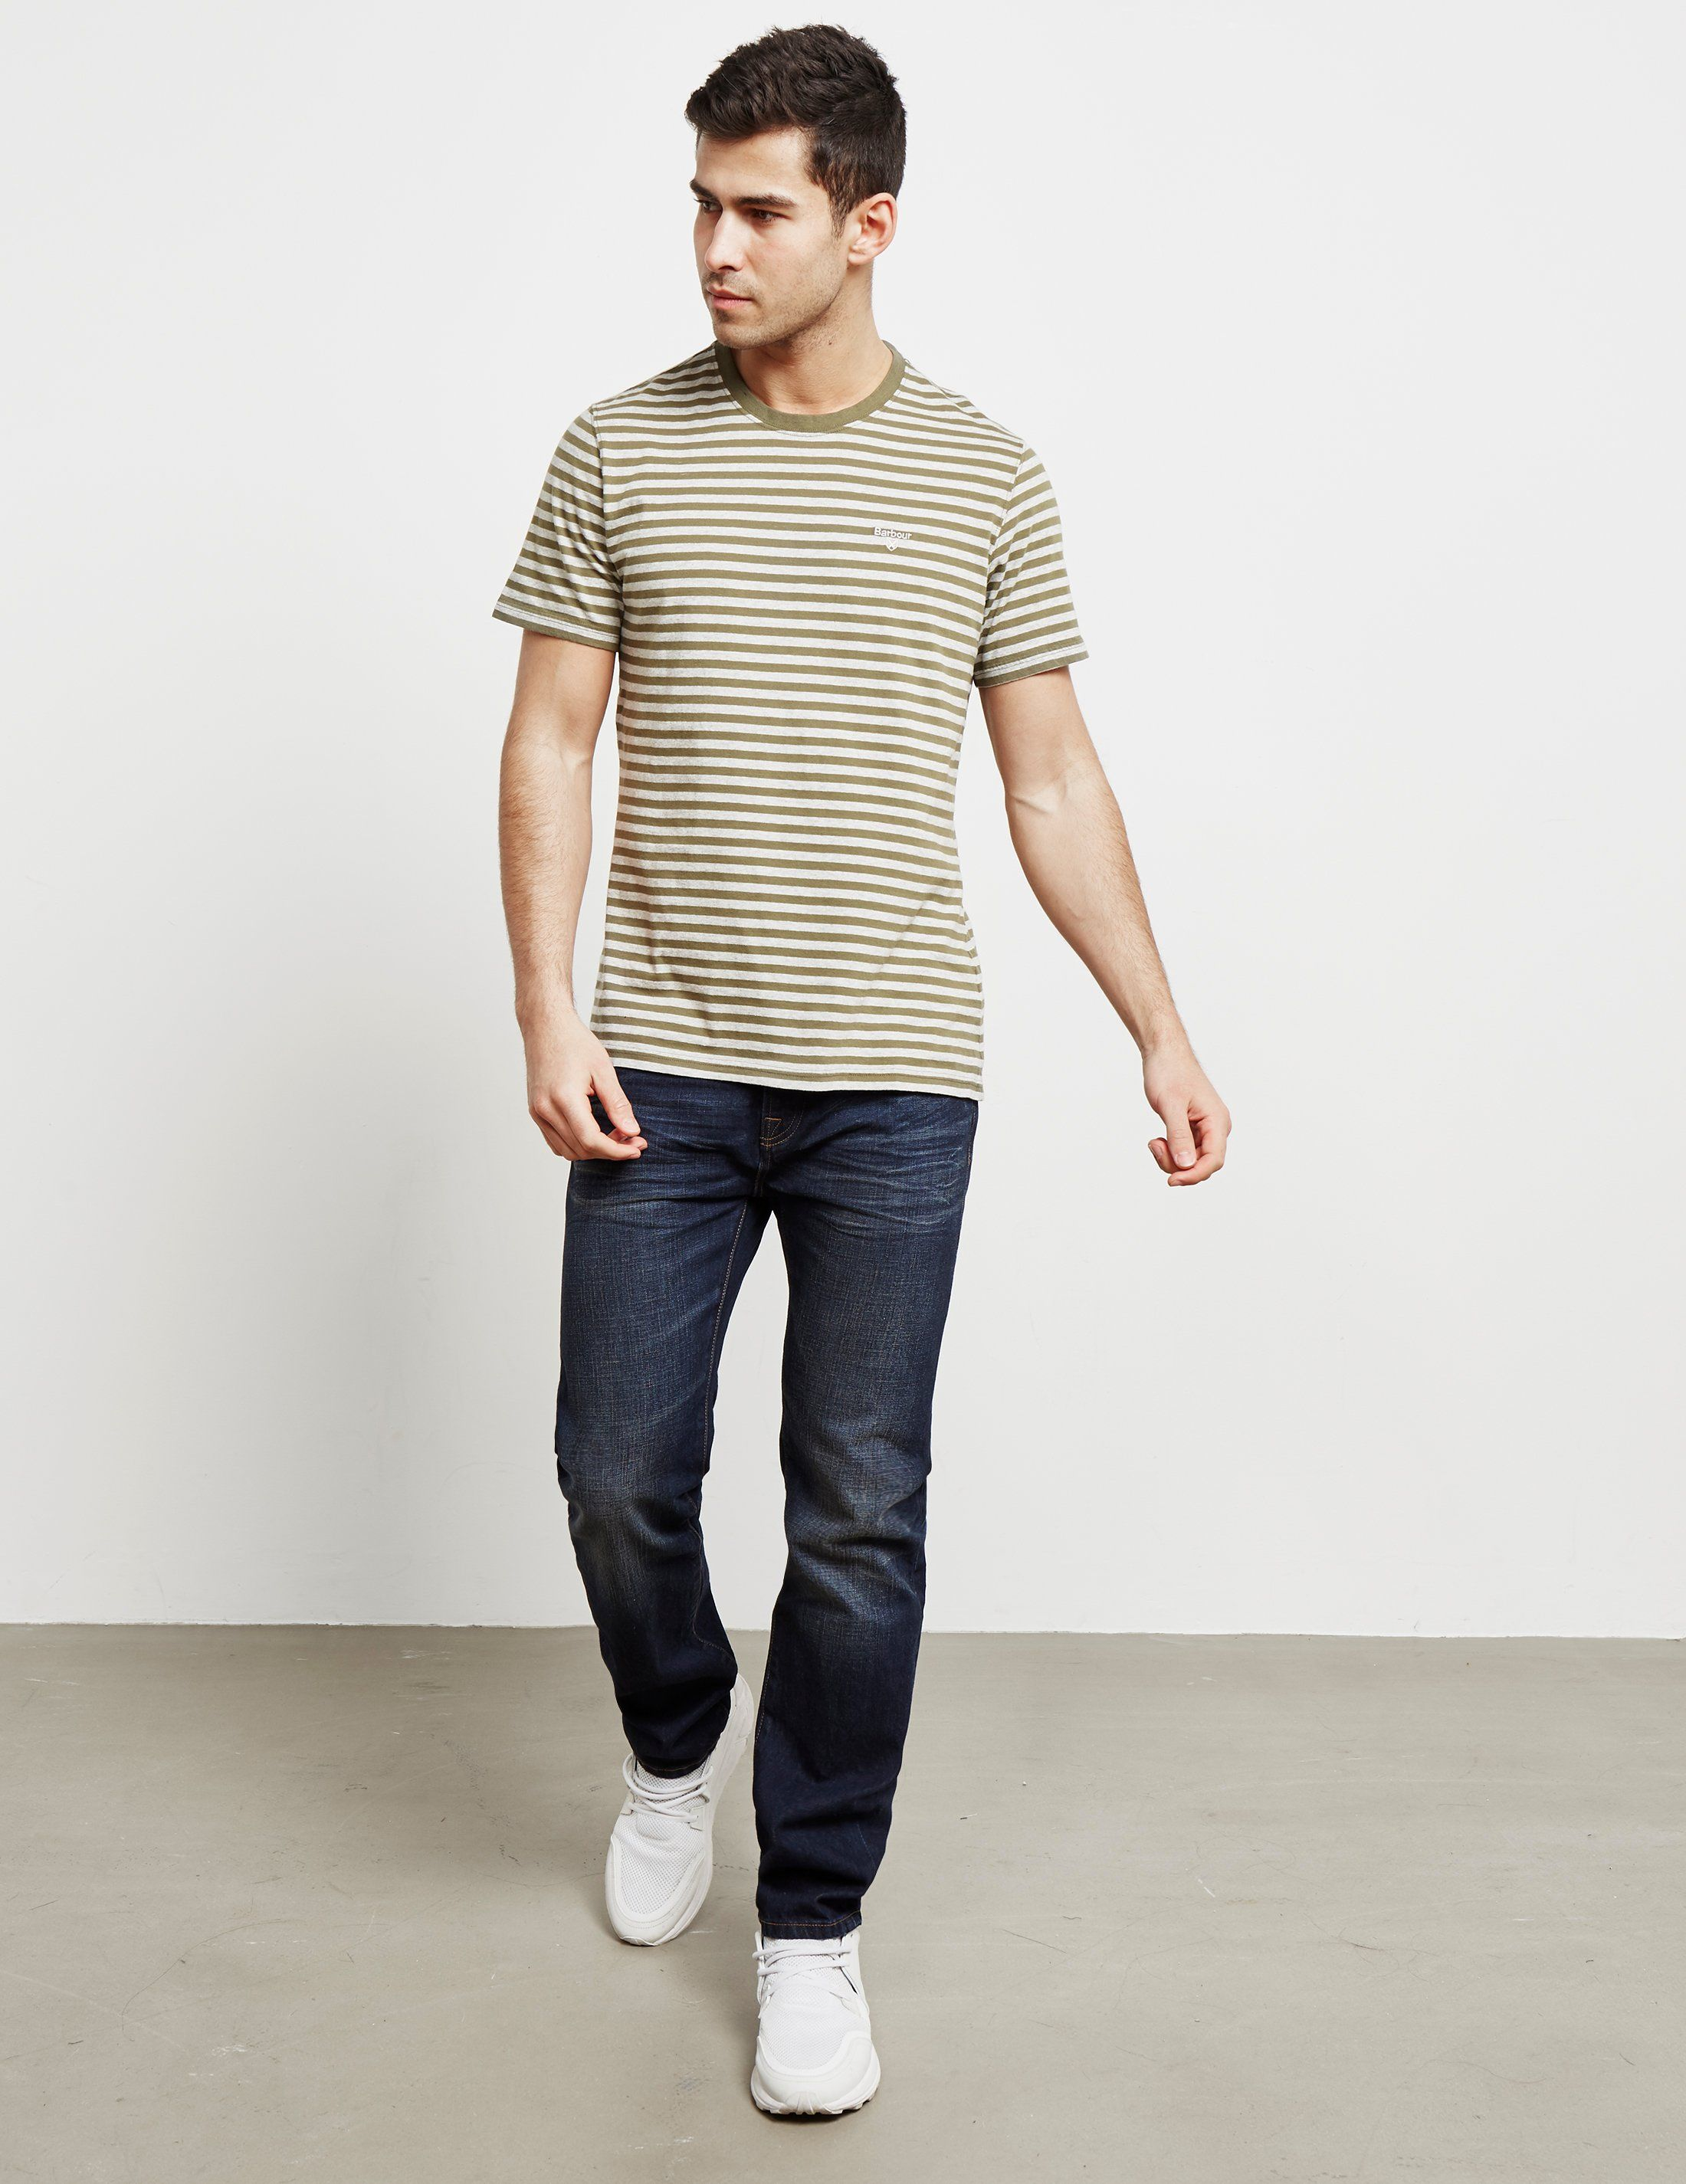 Barbour Delamere Short Sleeve Stripe T-Shirt